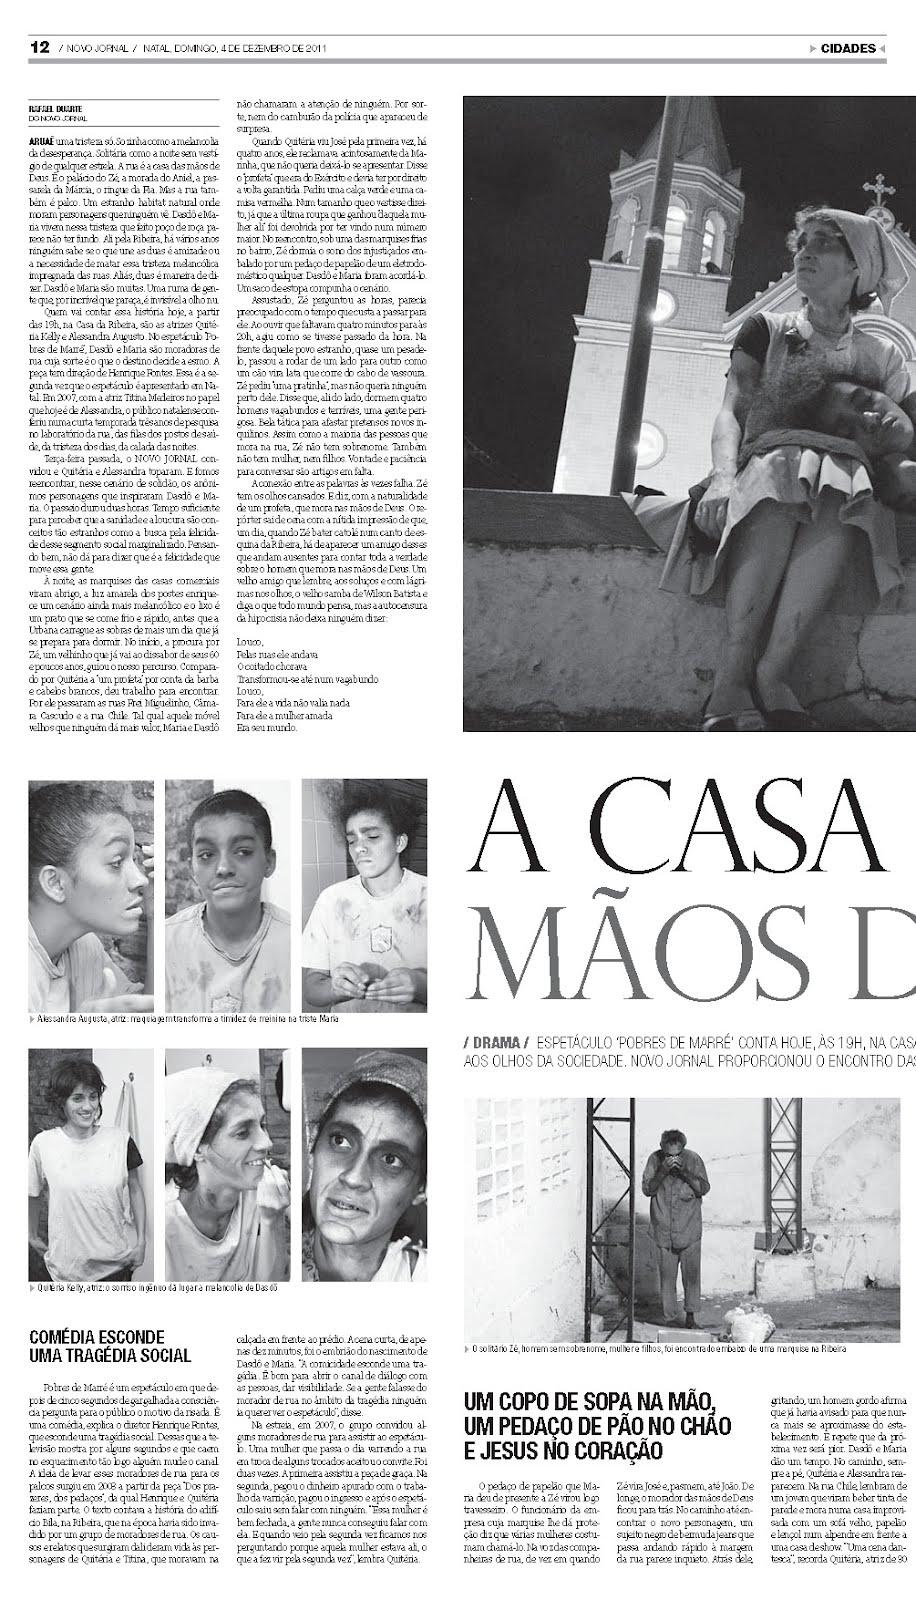 www.novojornal.jor.br_publicadas_Dezembro_2011_04-12-2011_Caderno_02_Page_1.jpg